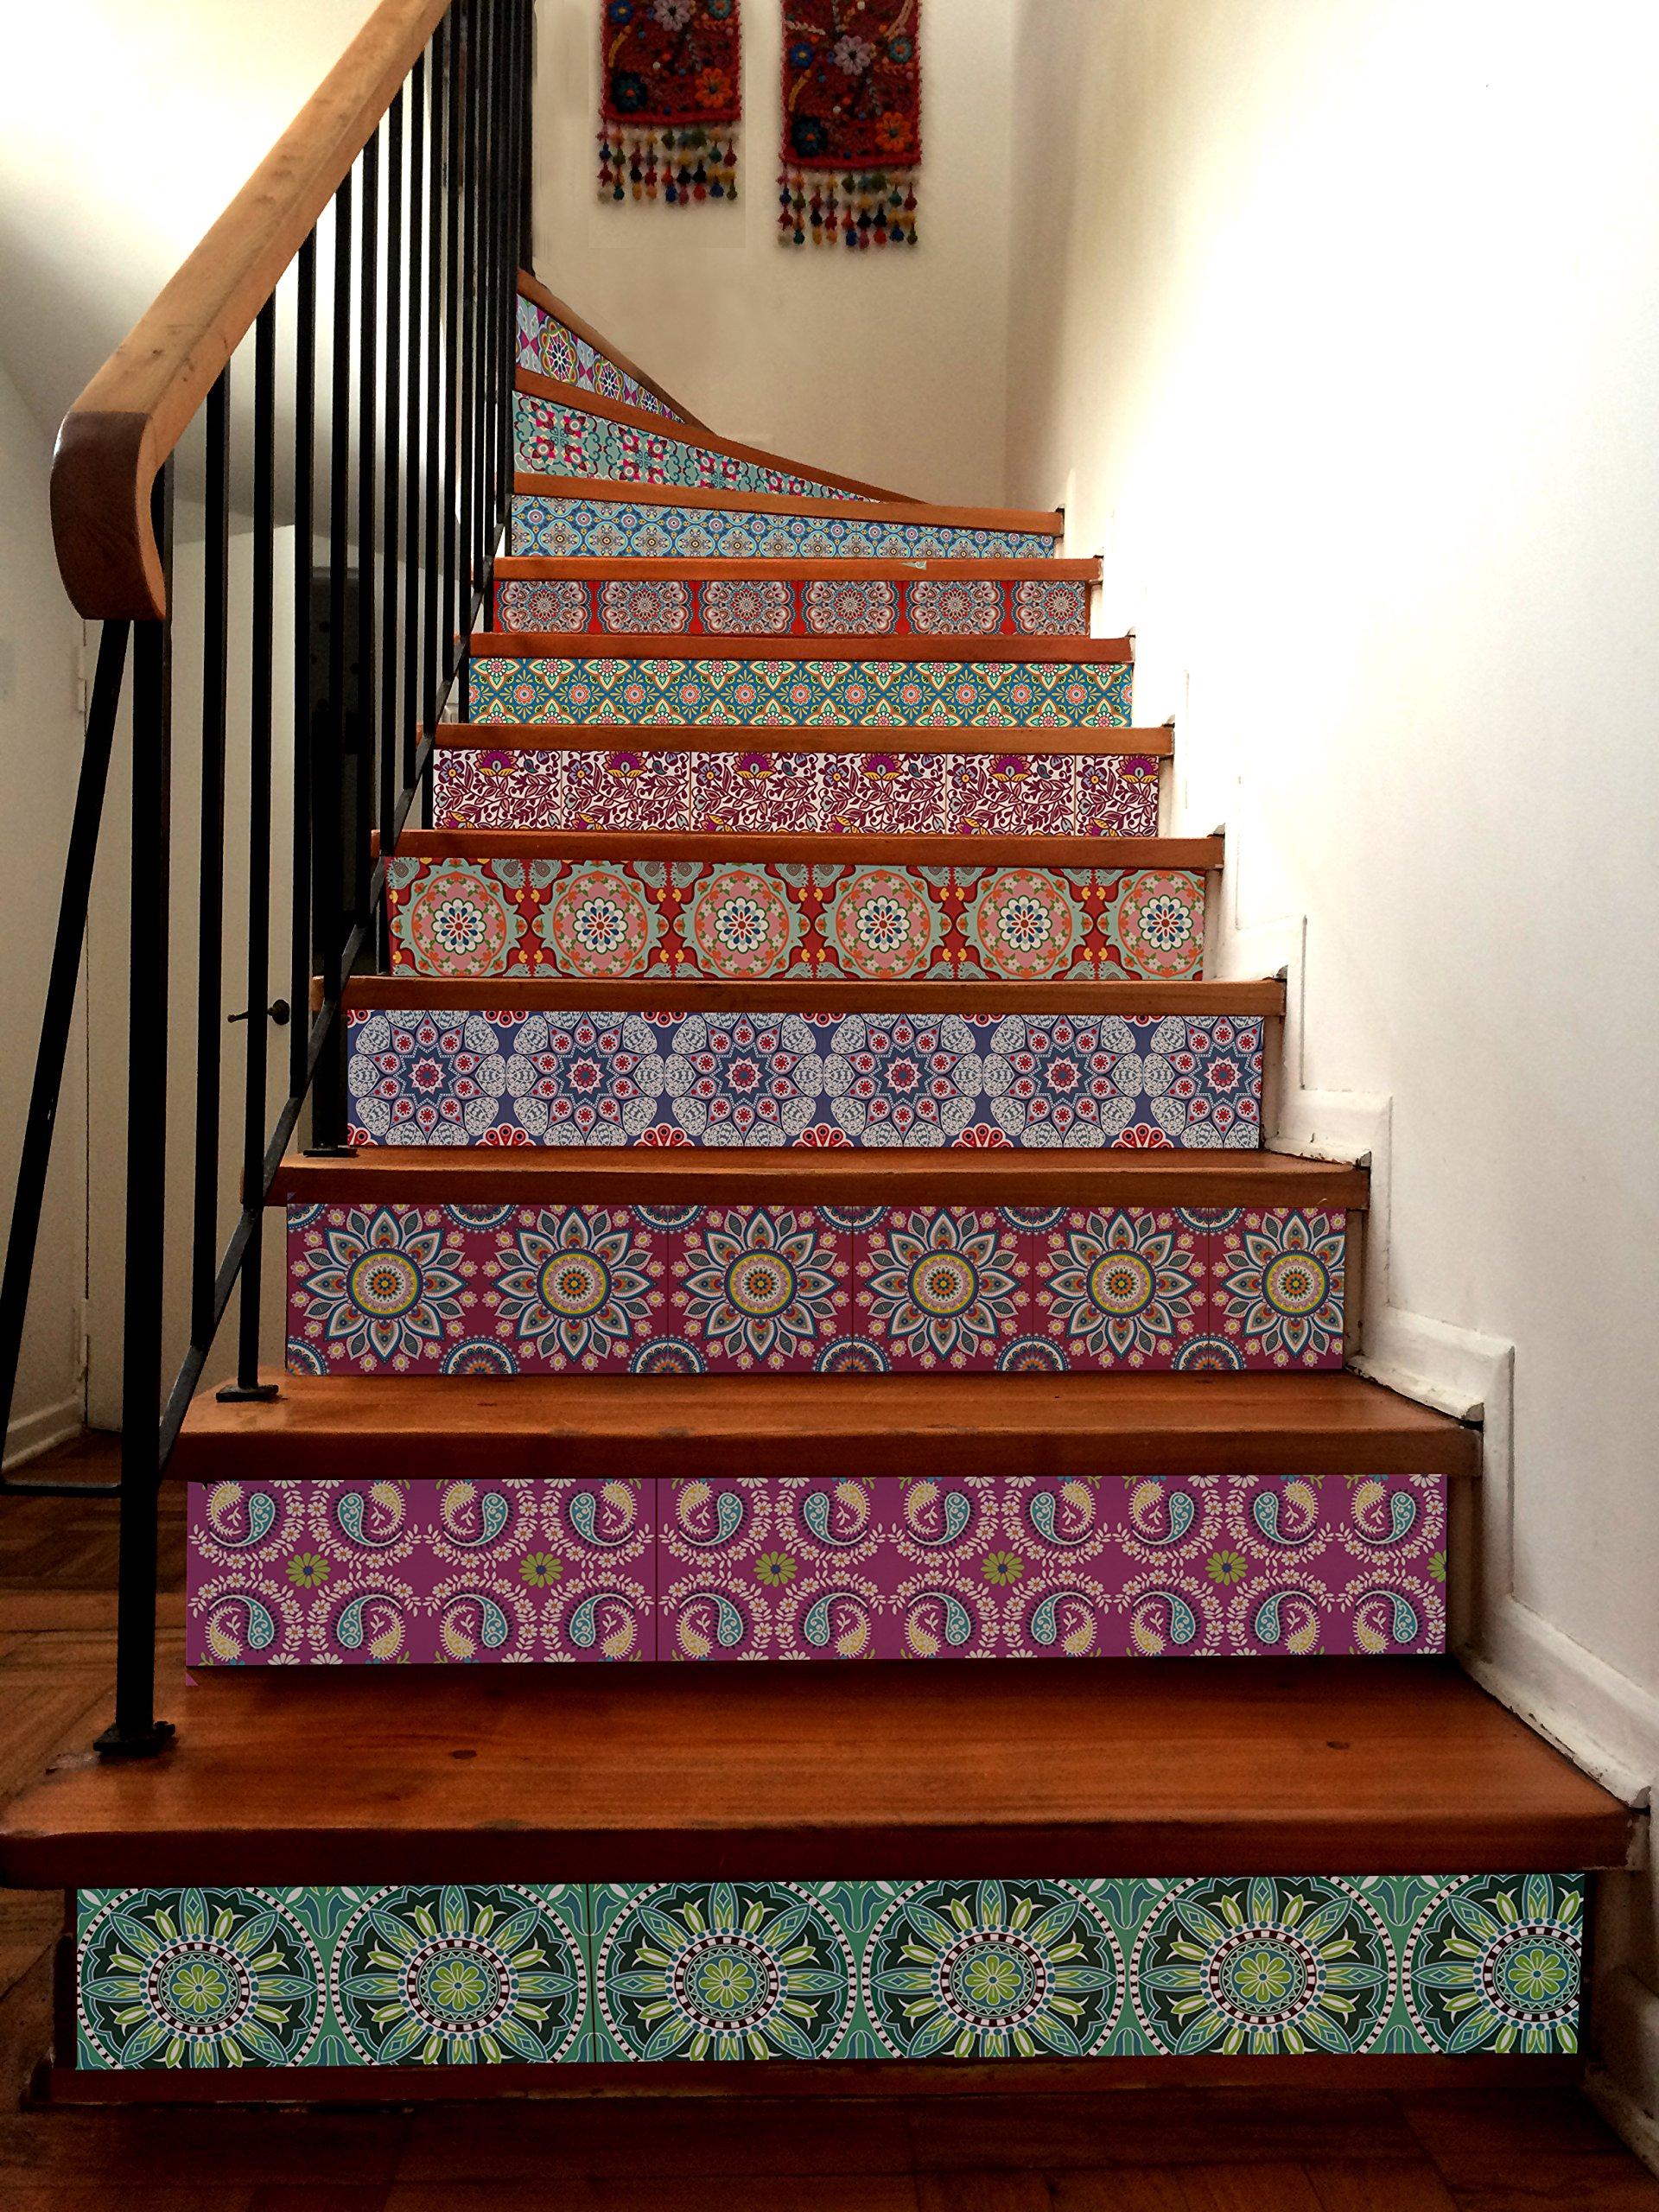 INDIA Decorative Tile Stickers Set 12 units 6x6 inches. Peel & Stick Vinyl Tiles. Home Decor. Furniture Decor. Backsplash. by VALDECO